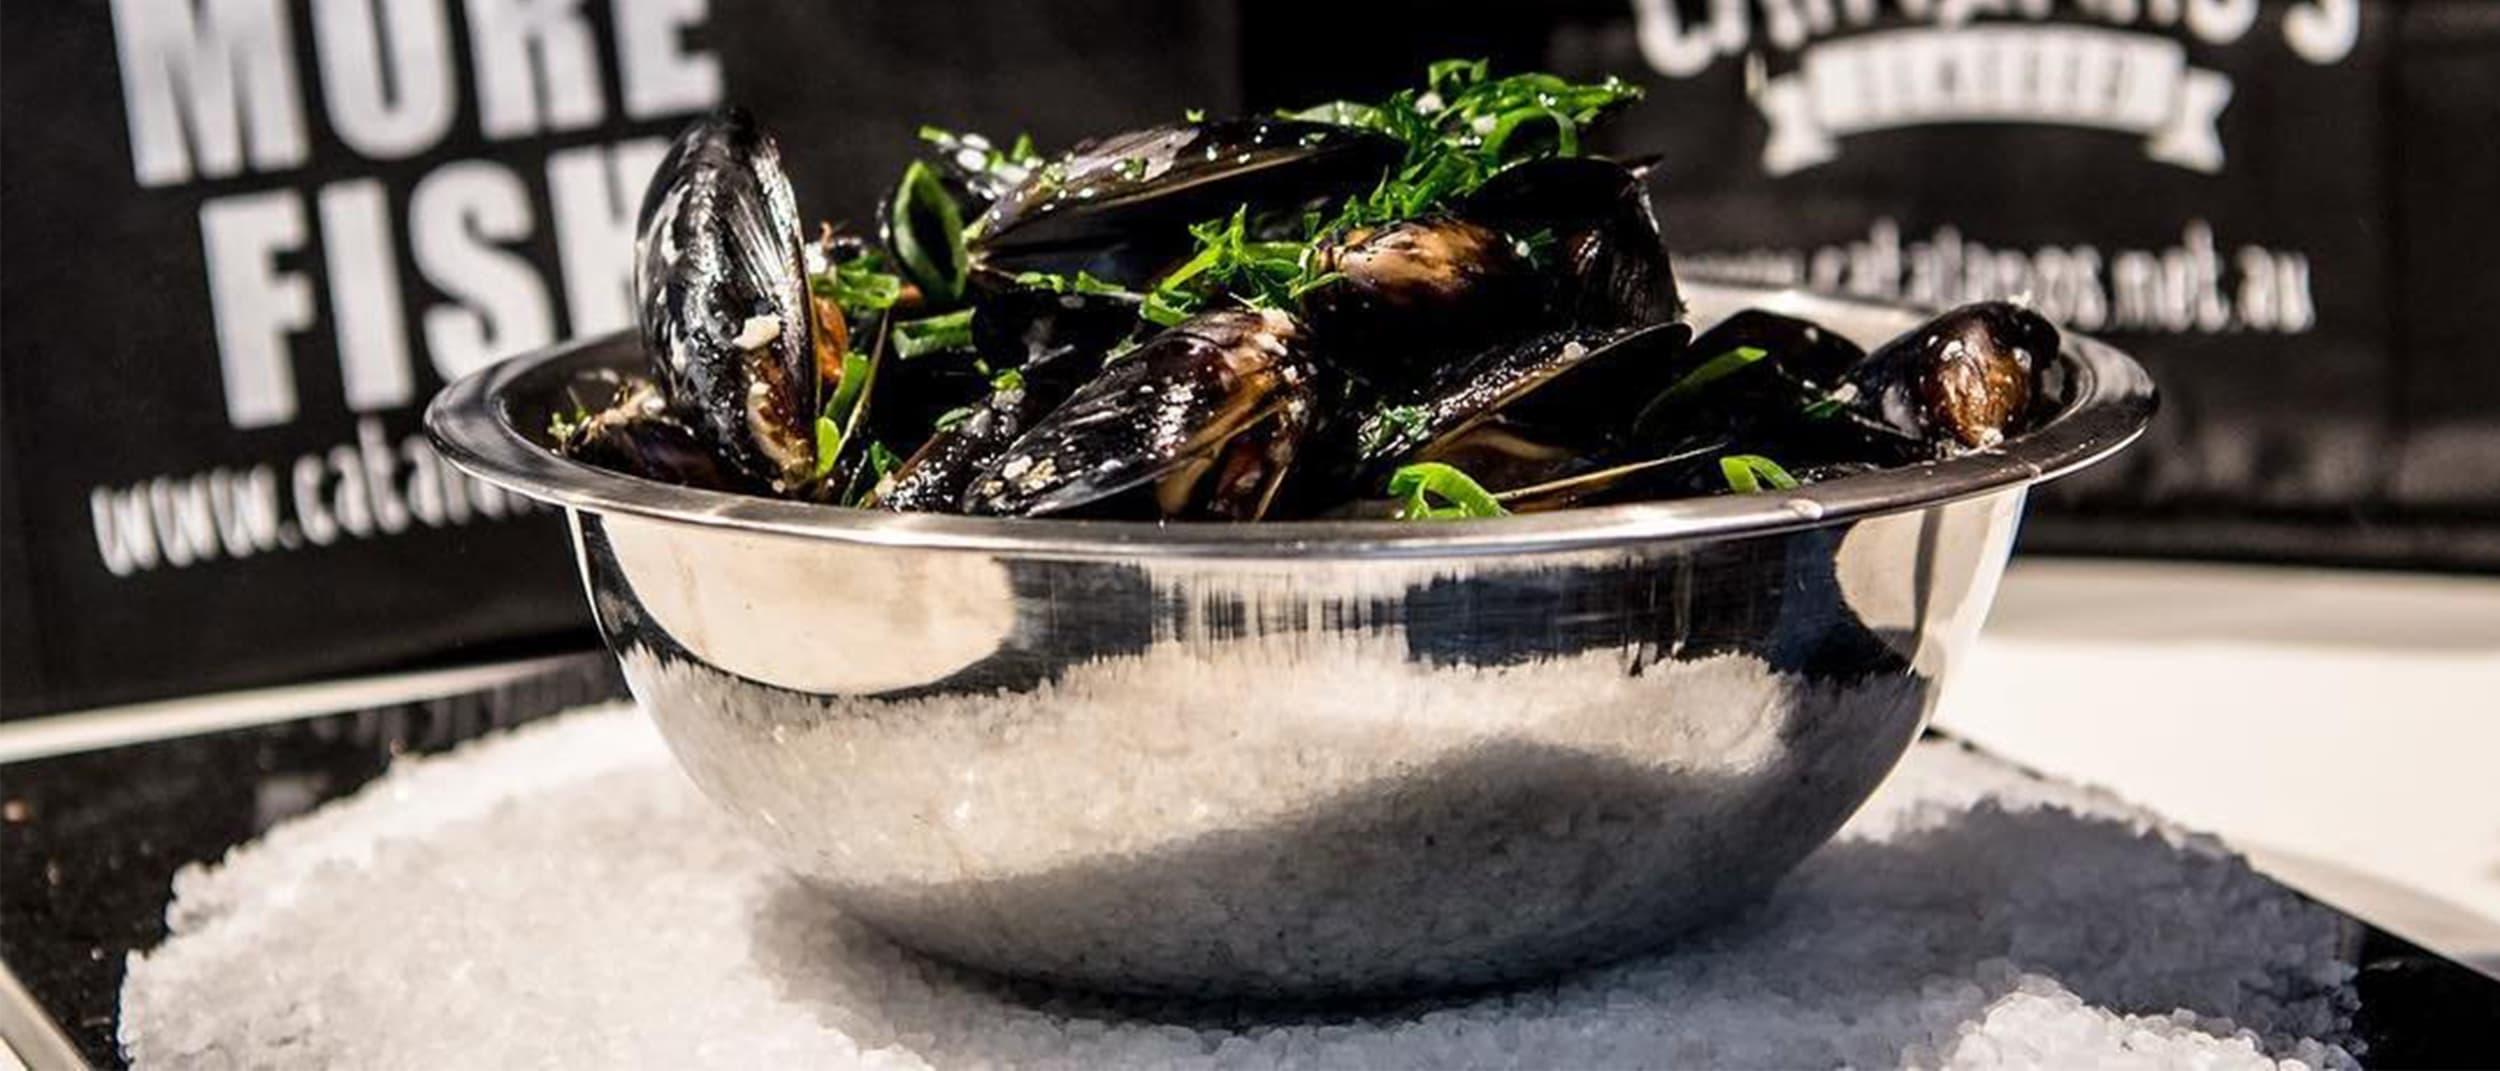 Catalano's Seafood: save $3 per kilo on fresh SA mussels